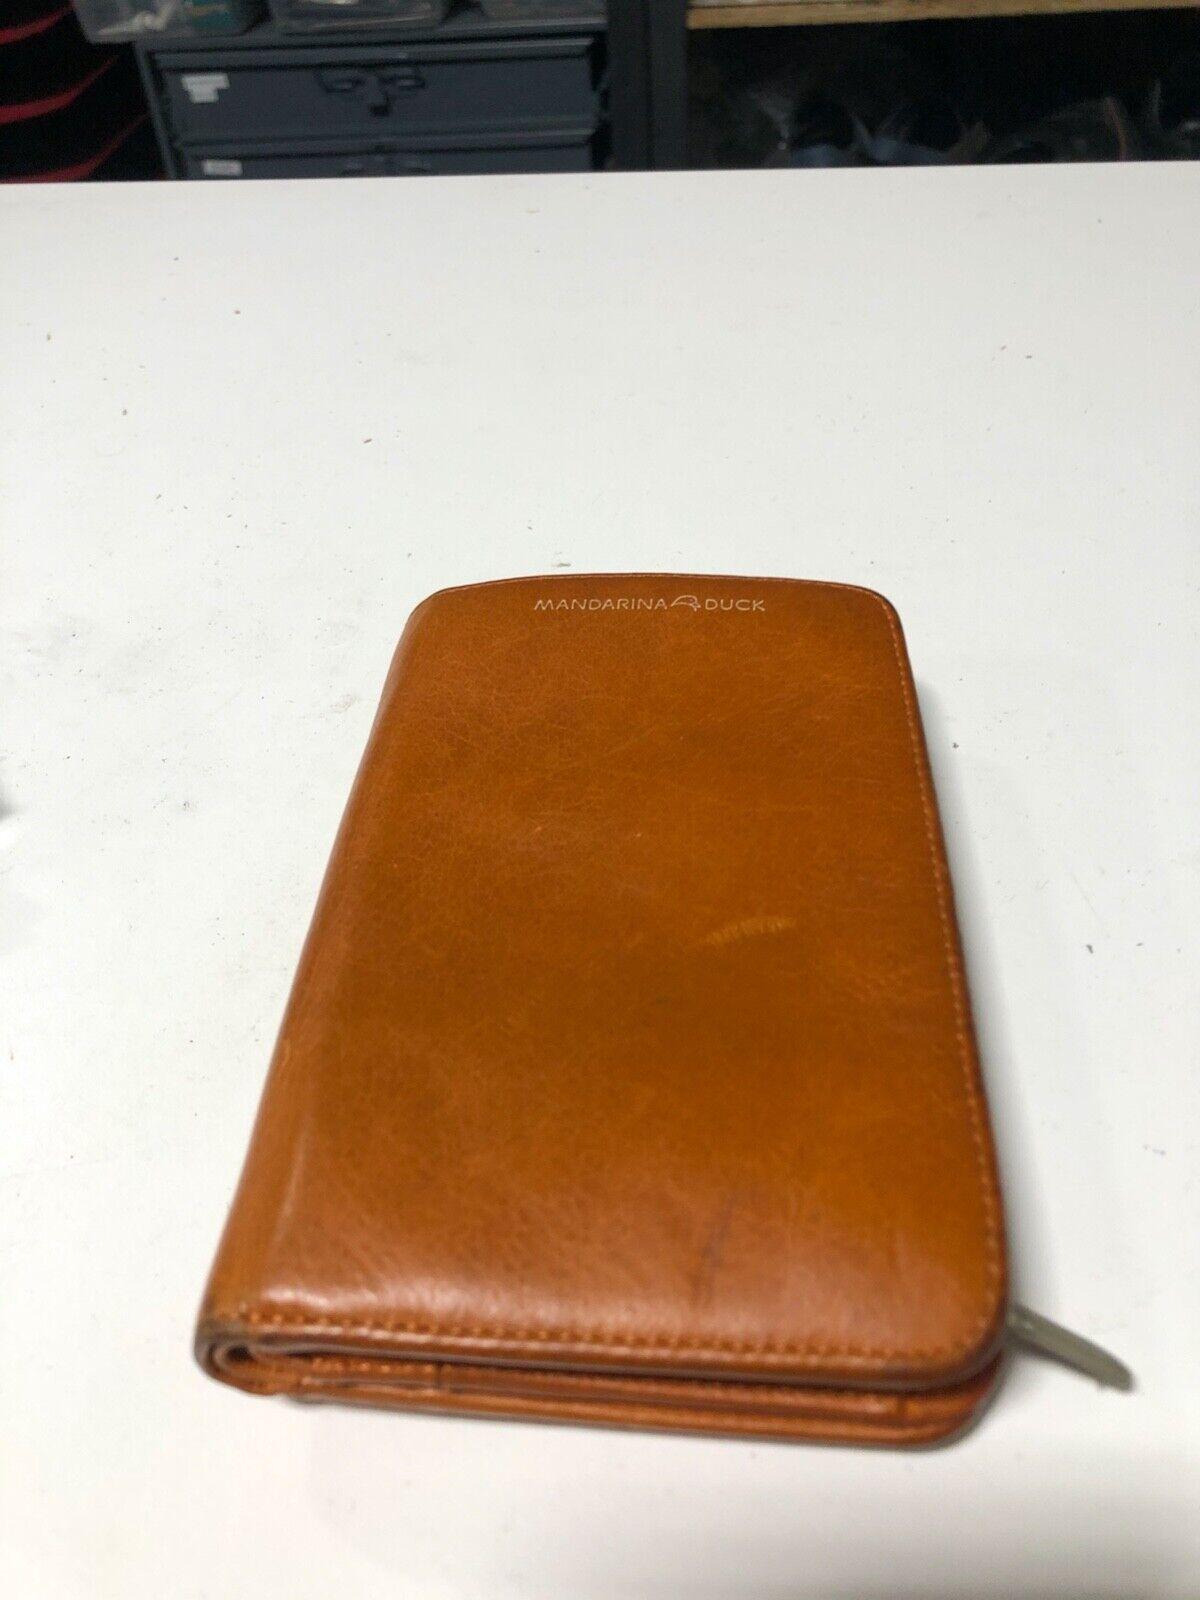 Mandarina Duck Ladies' Leather Wallet.